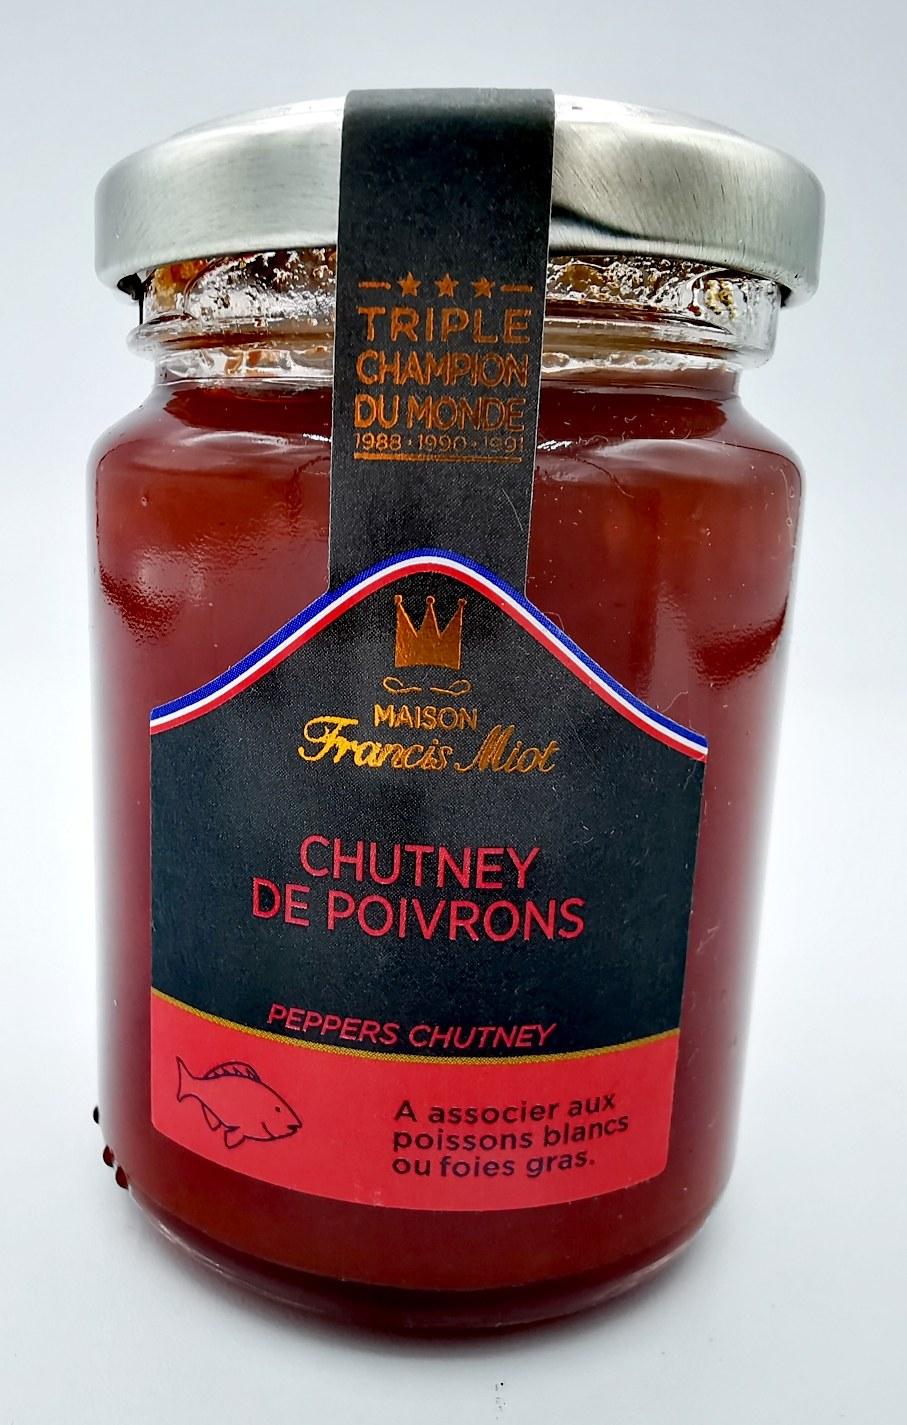 Chutney de Poivrons - Francis Miot - chutney - vallée d'aspe - saveurs associées